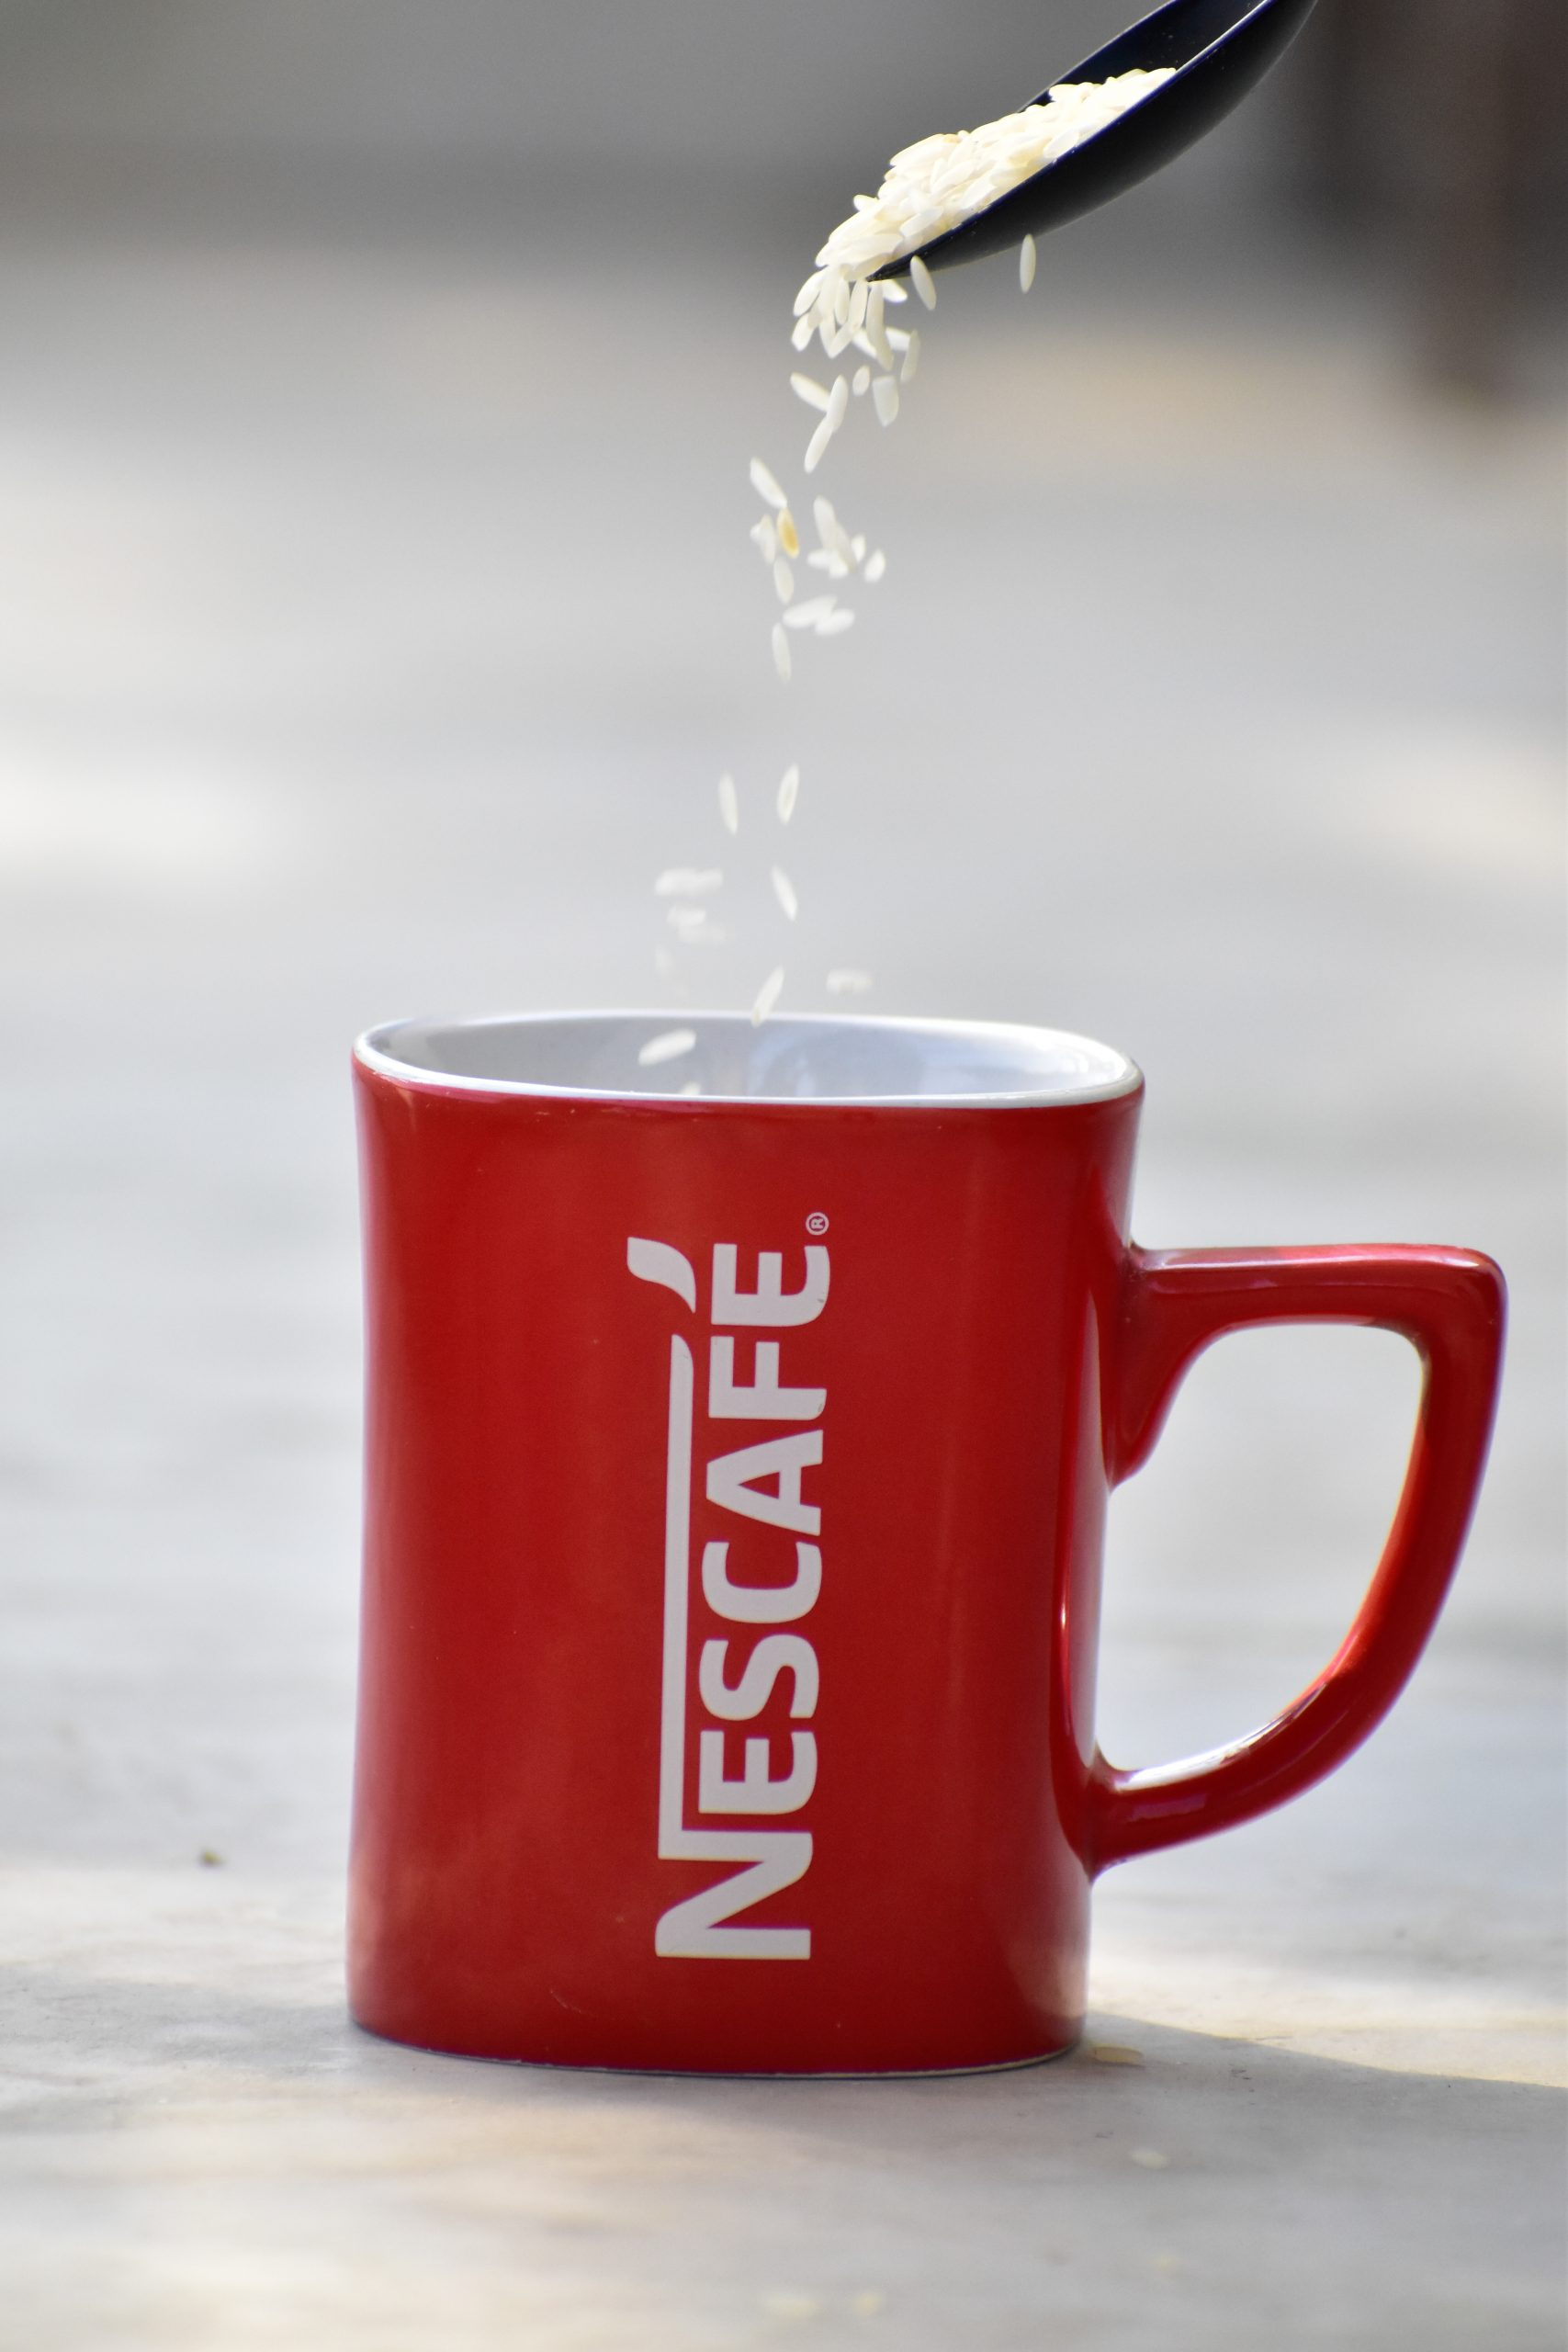 rice grains falling in a mug